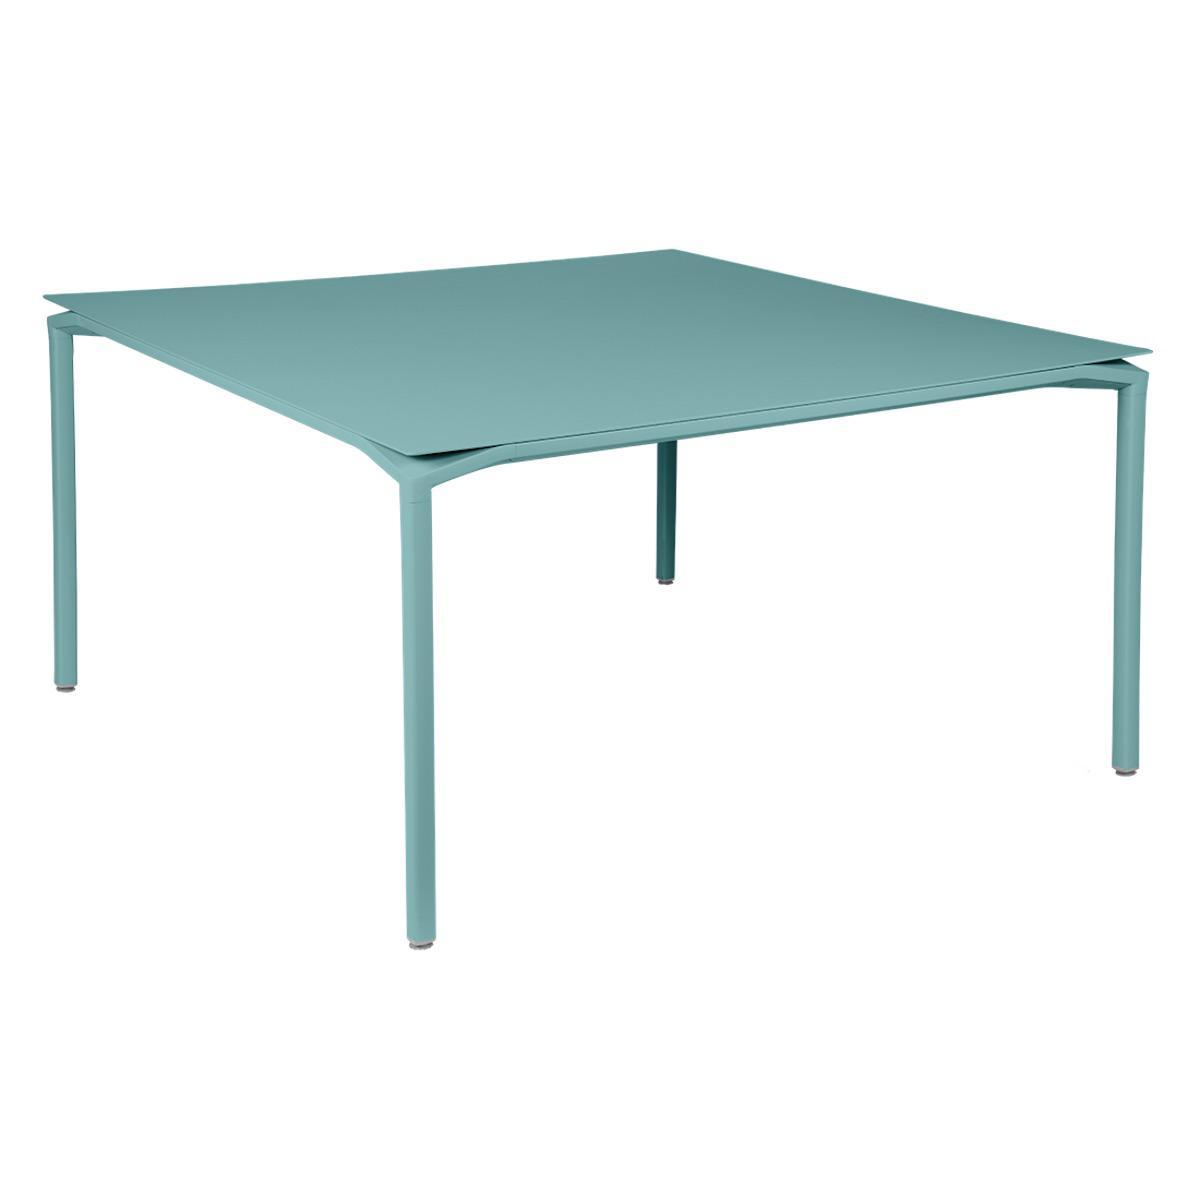 Table 140x140cm CALVI Fermob bleu lagune